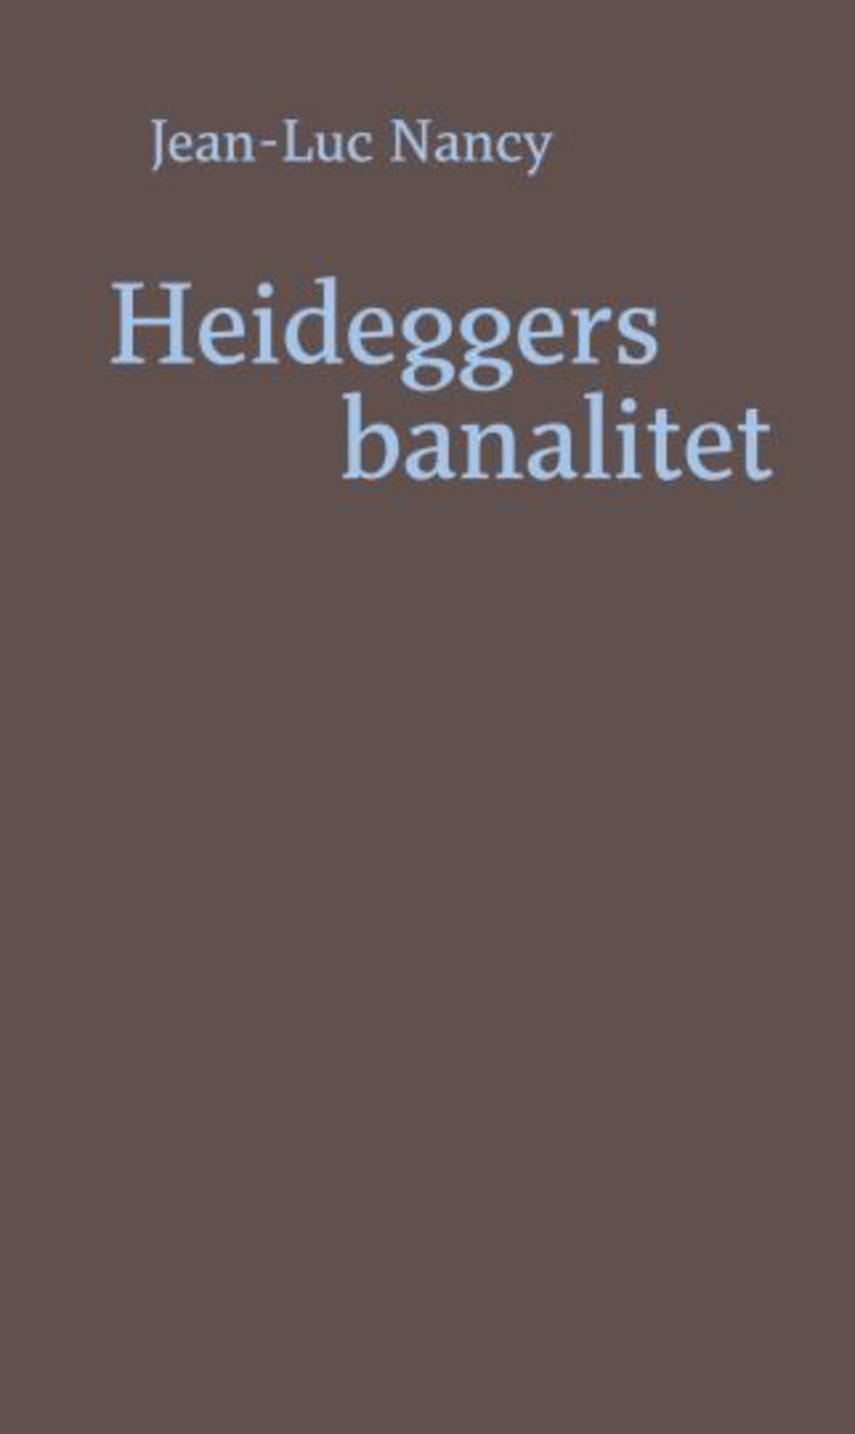 Jean-Luc Nancy: Heideggers banalitet